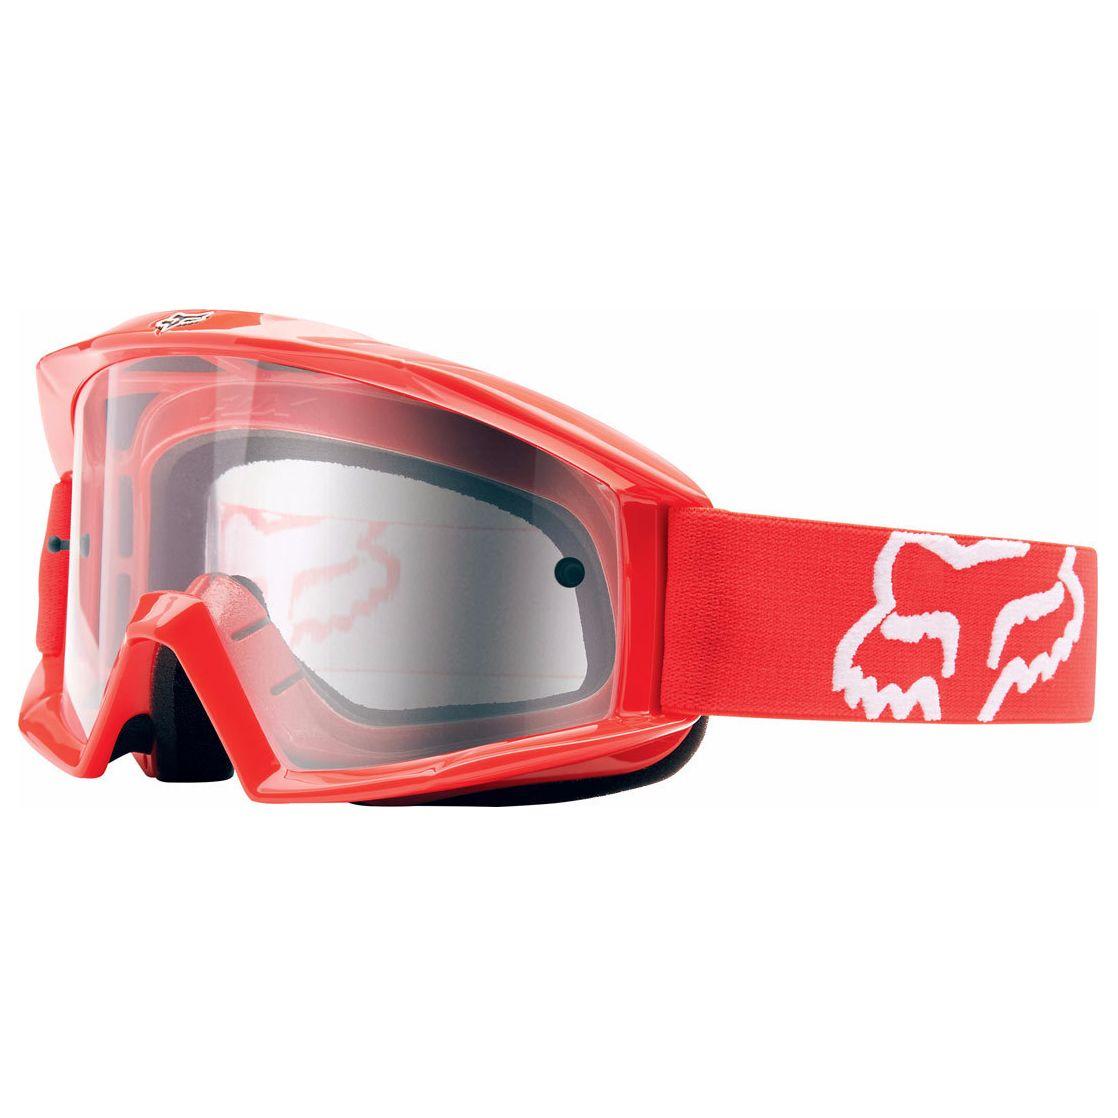 Masque Cross Fox Main - Rouge -